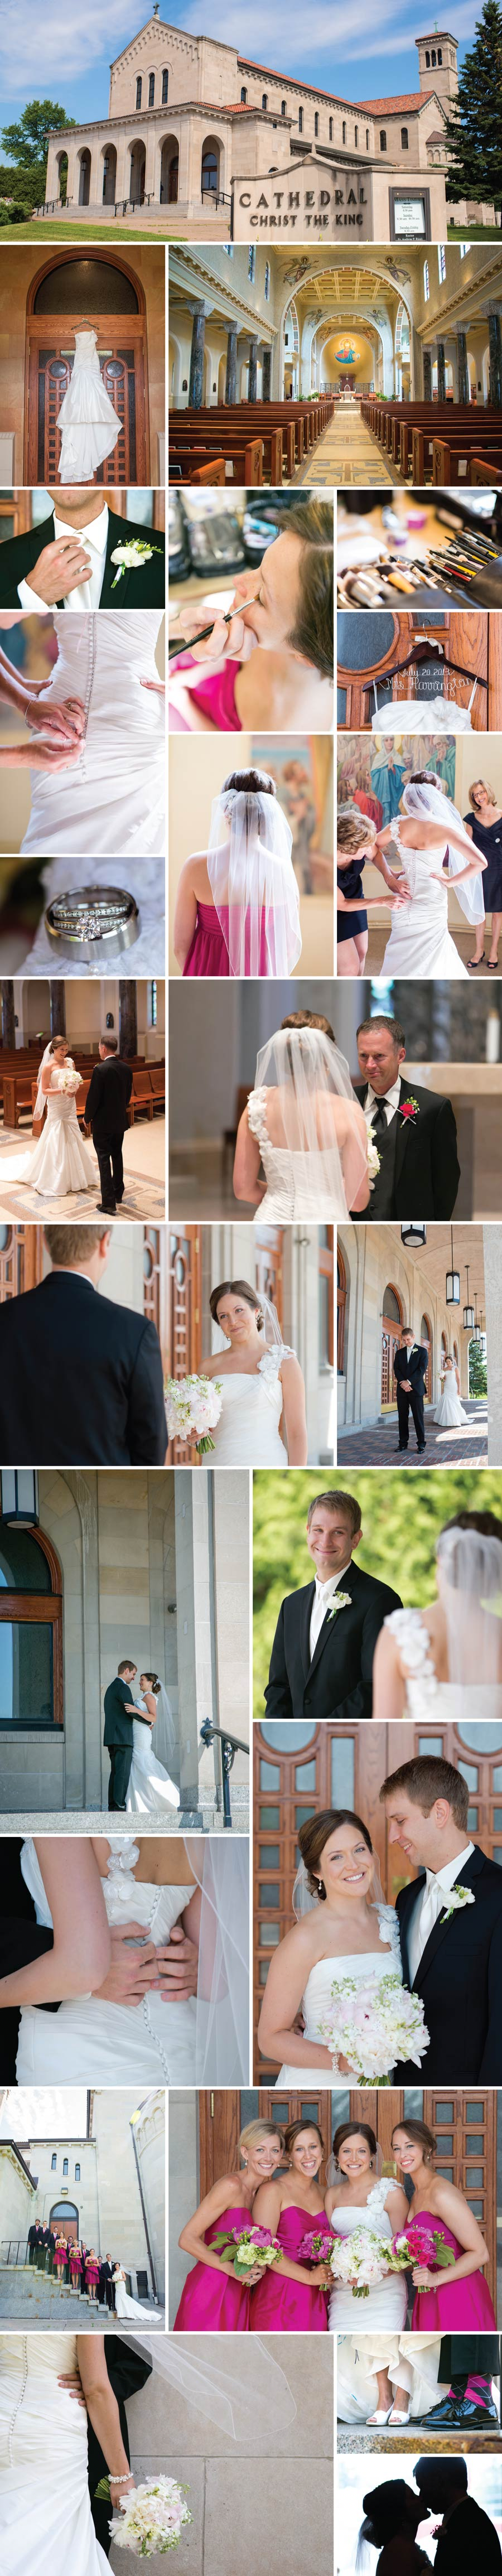 cathedral-of-christ-the-king-superior-wi-wedding-greysolon-ballroom-bryan-jonathan-weddings1